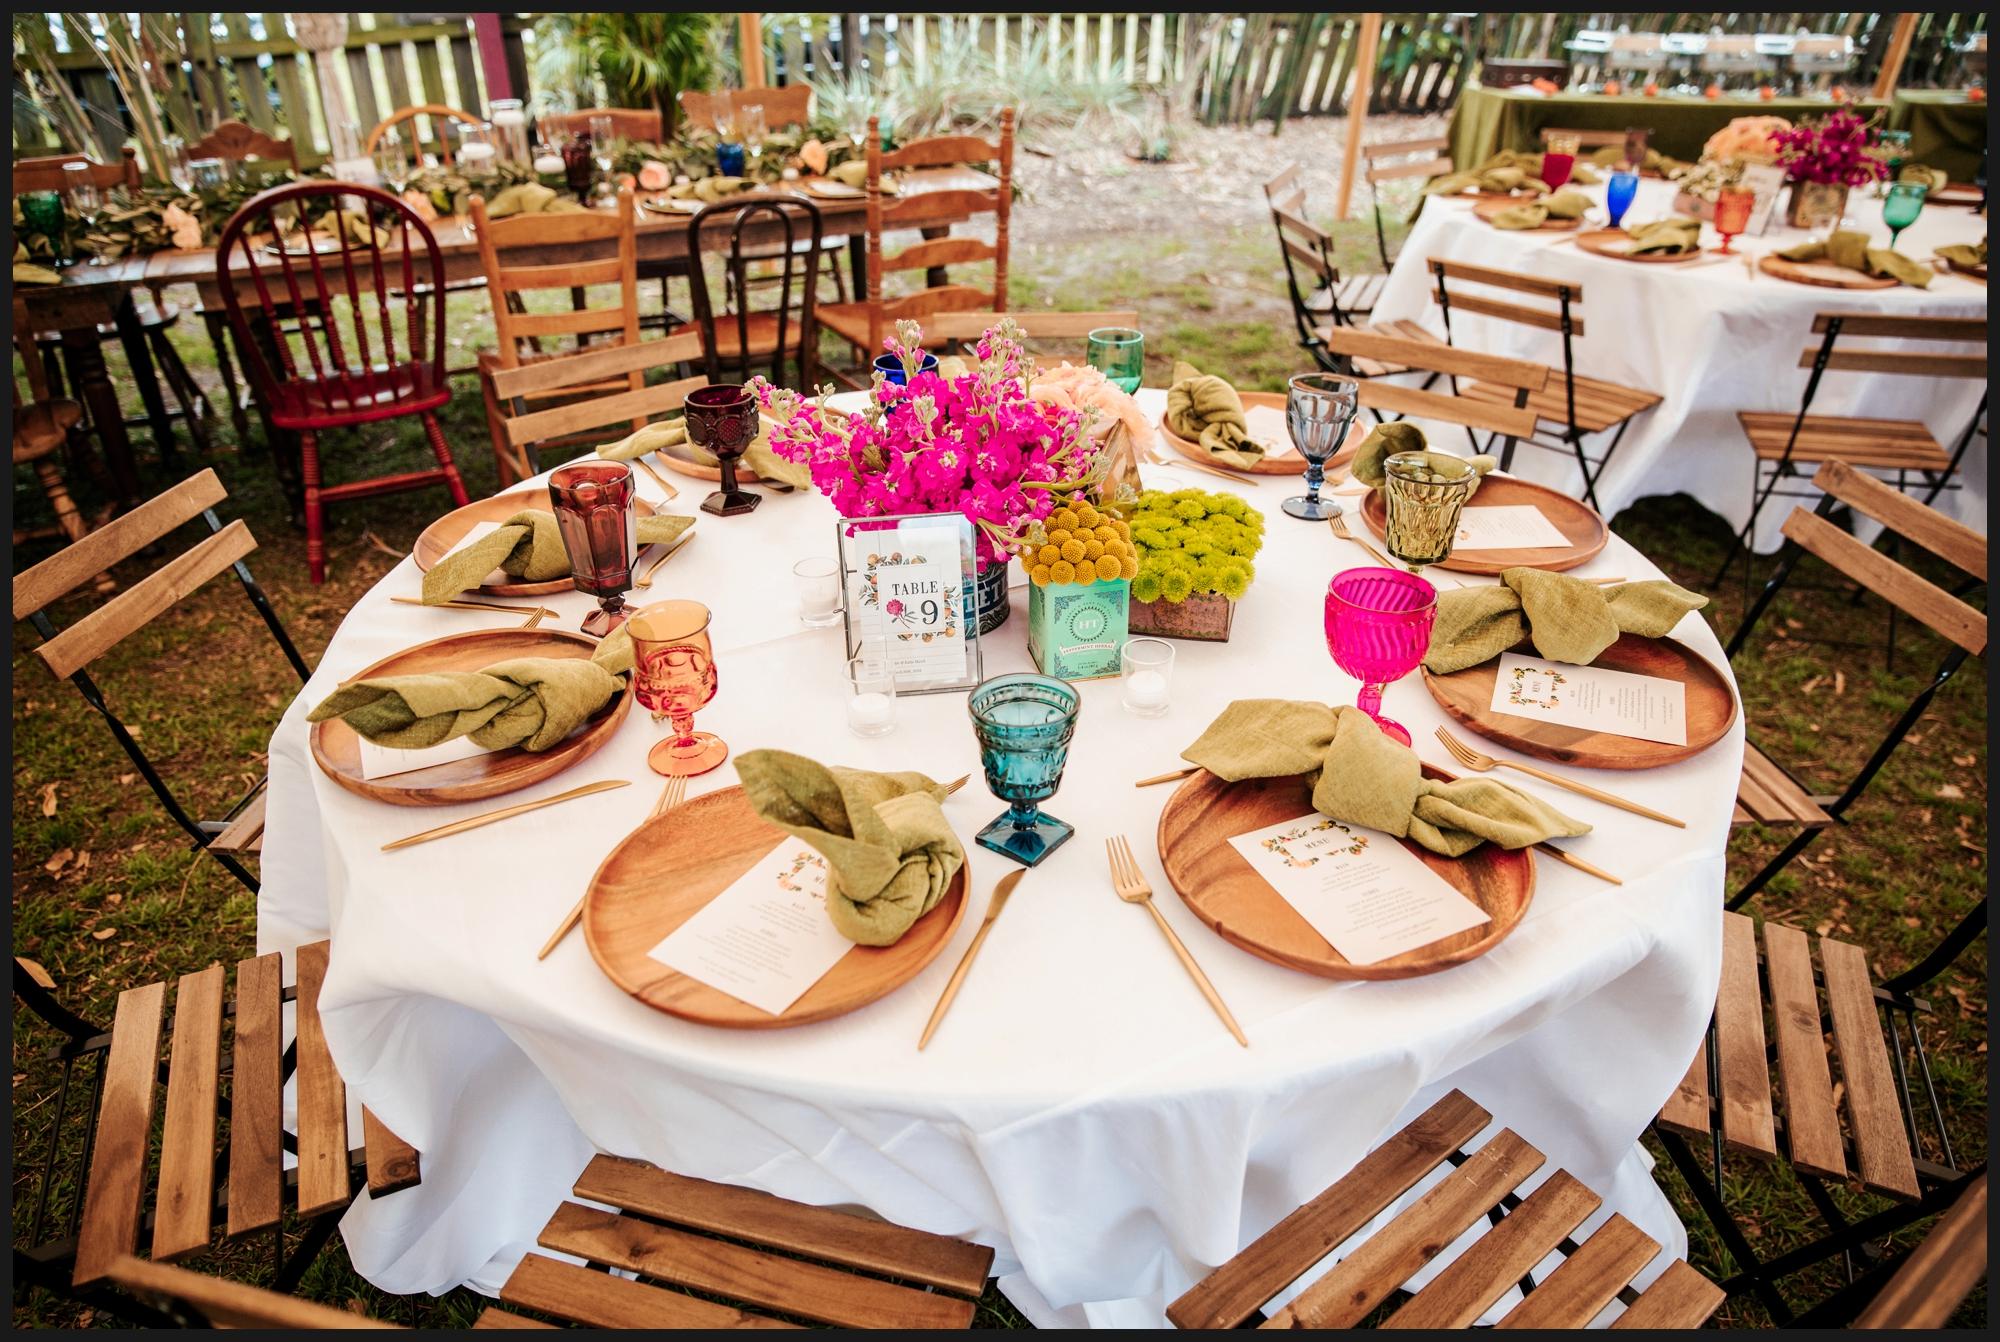 Orlando-Wedding-Photographer-destination-wedding-photographer-florida-wedding-photographer-bohemian-wedding-photographer_2022.jpg